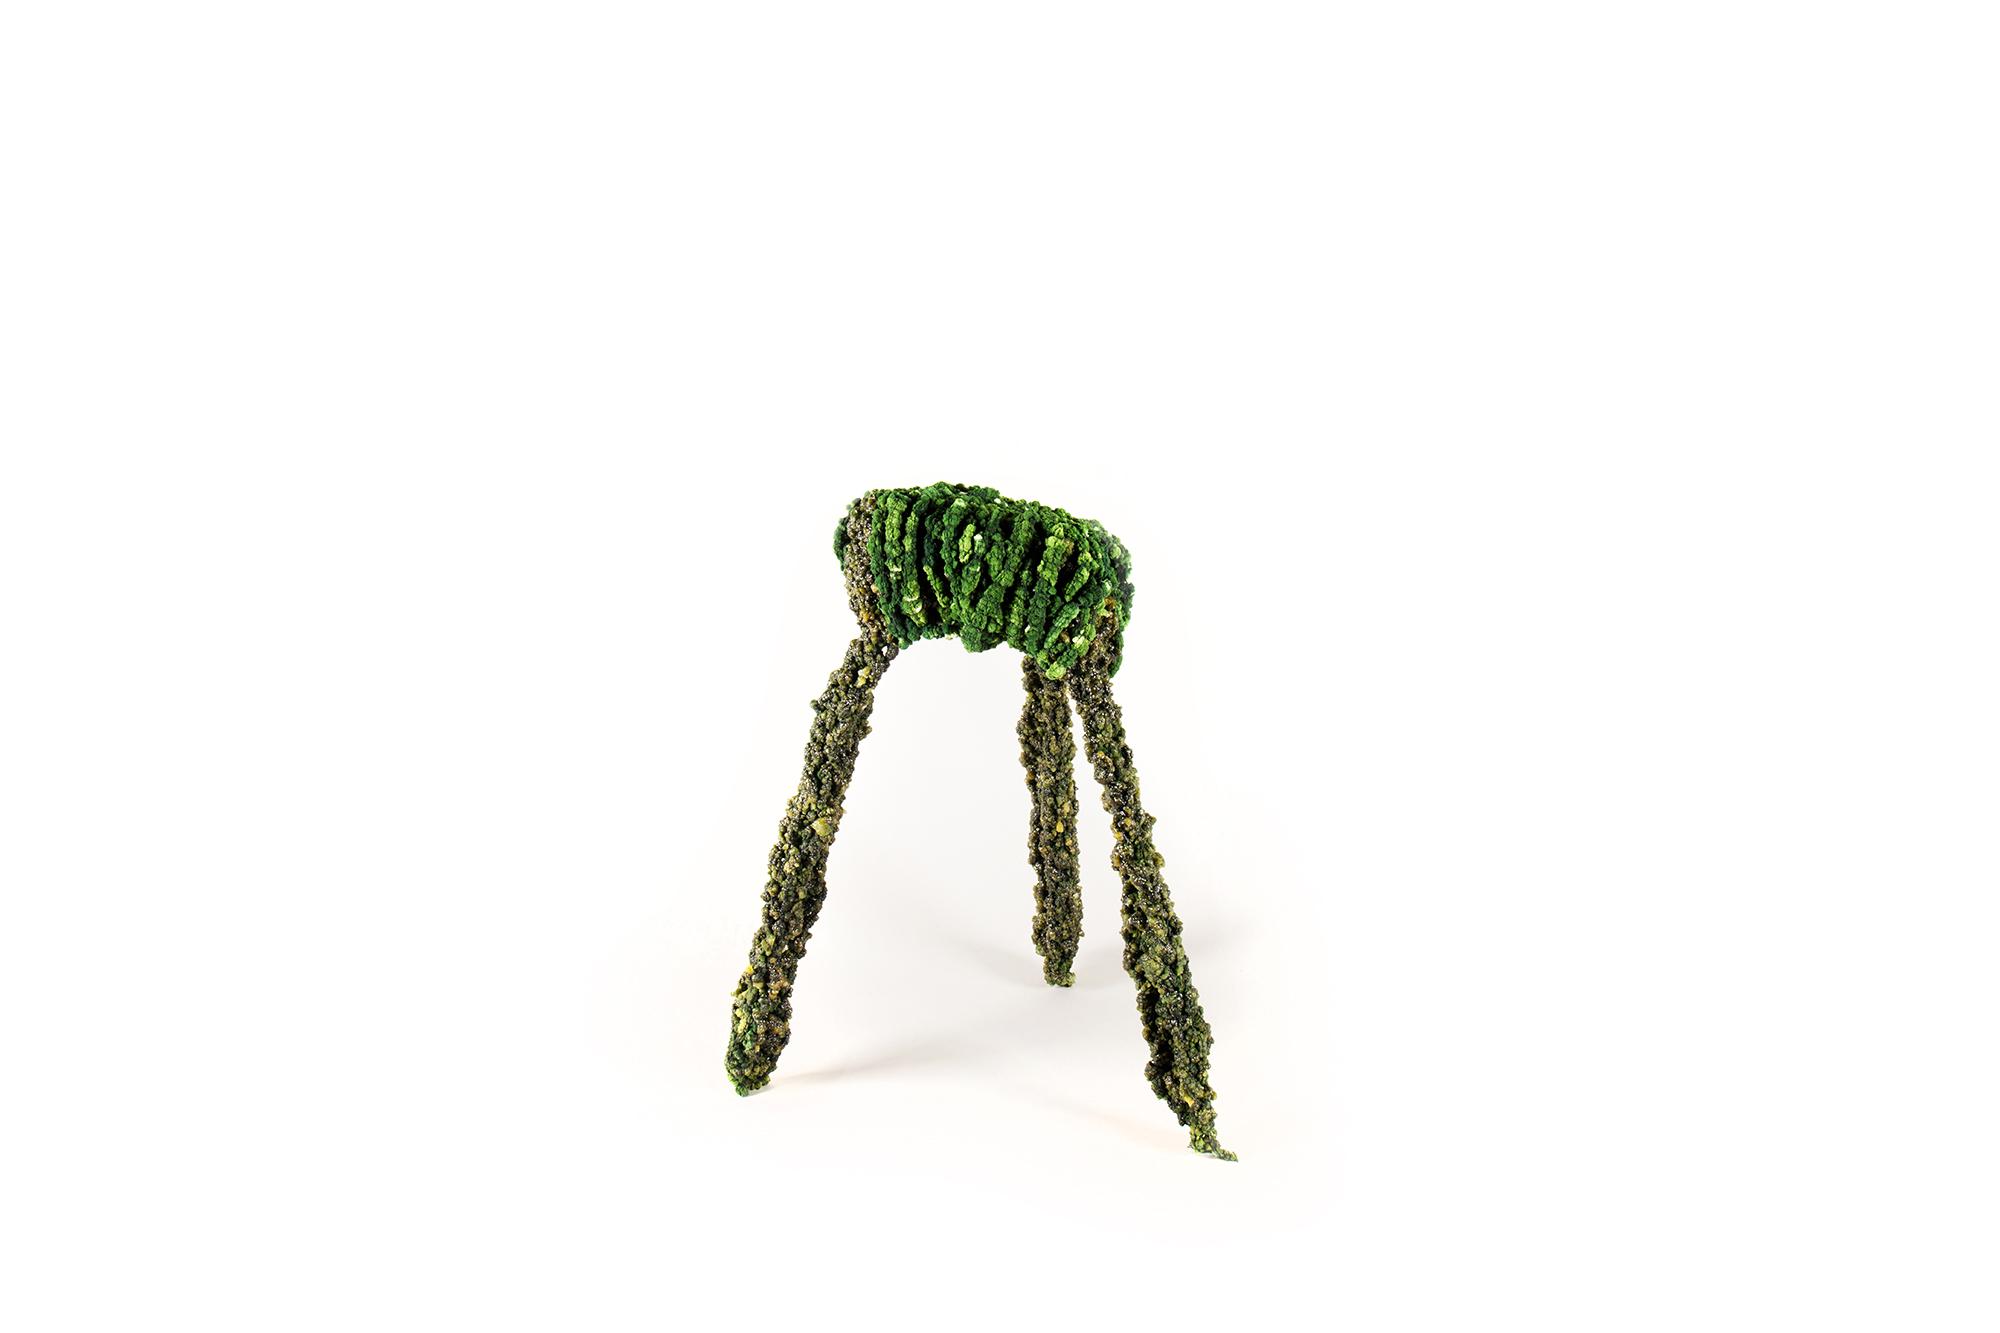 Overgrown Objects By Felix Poettinger